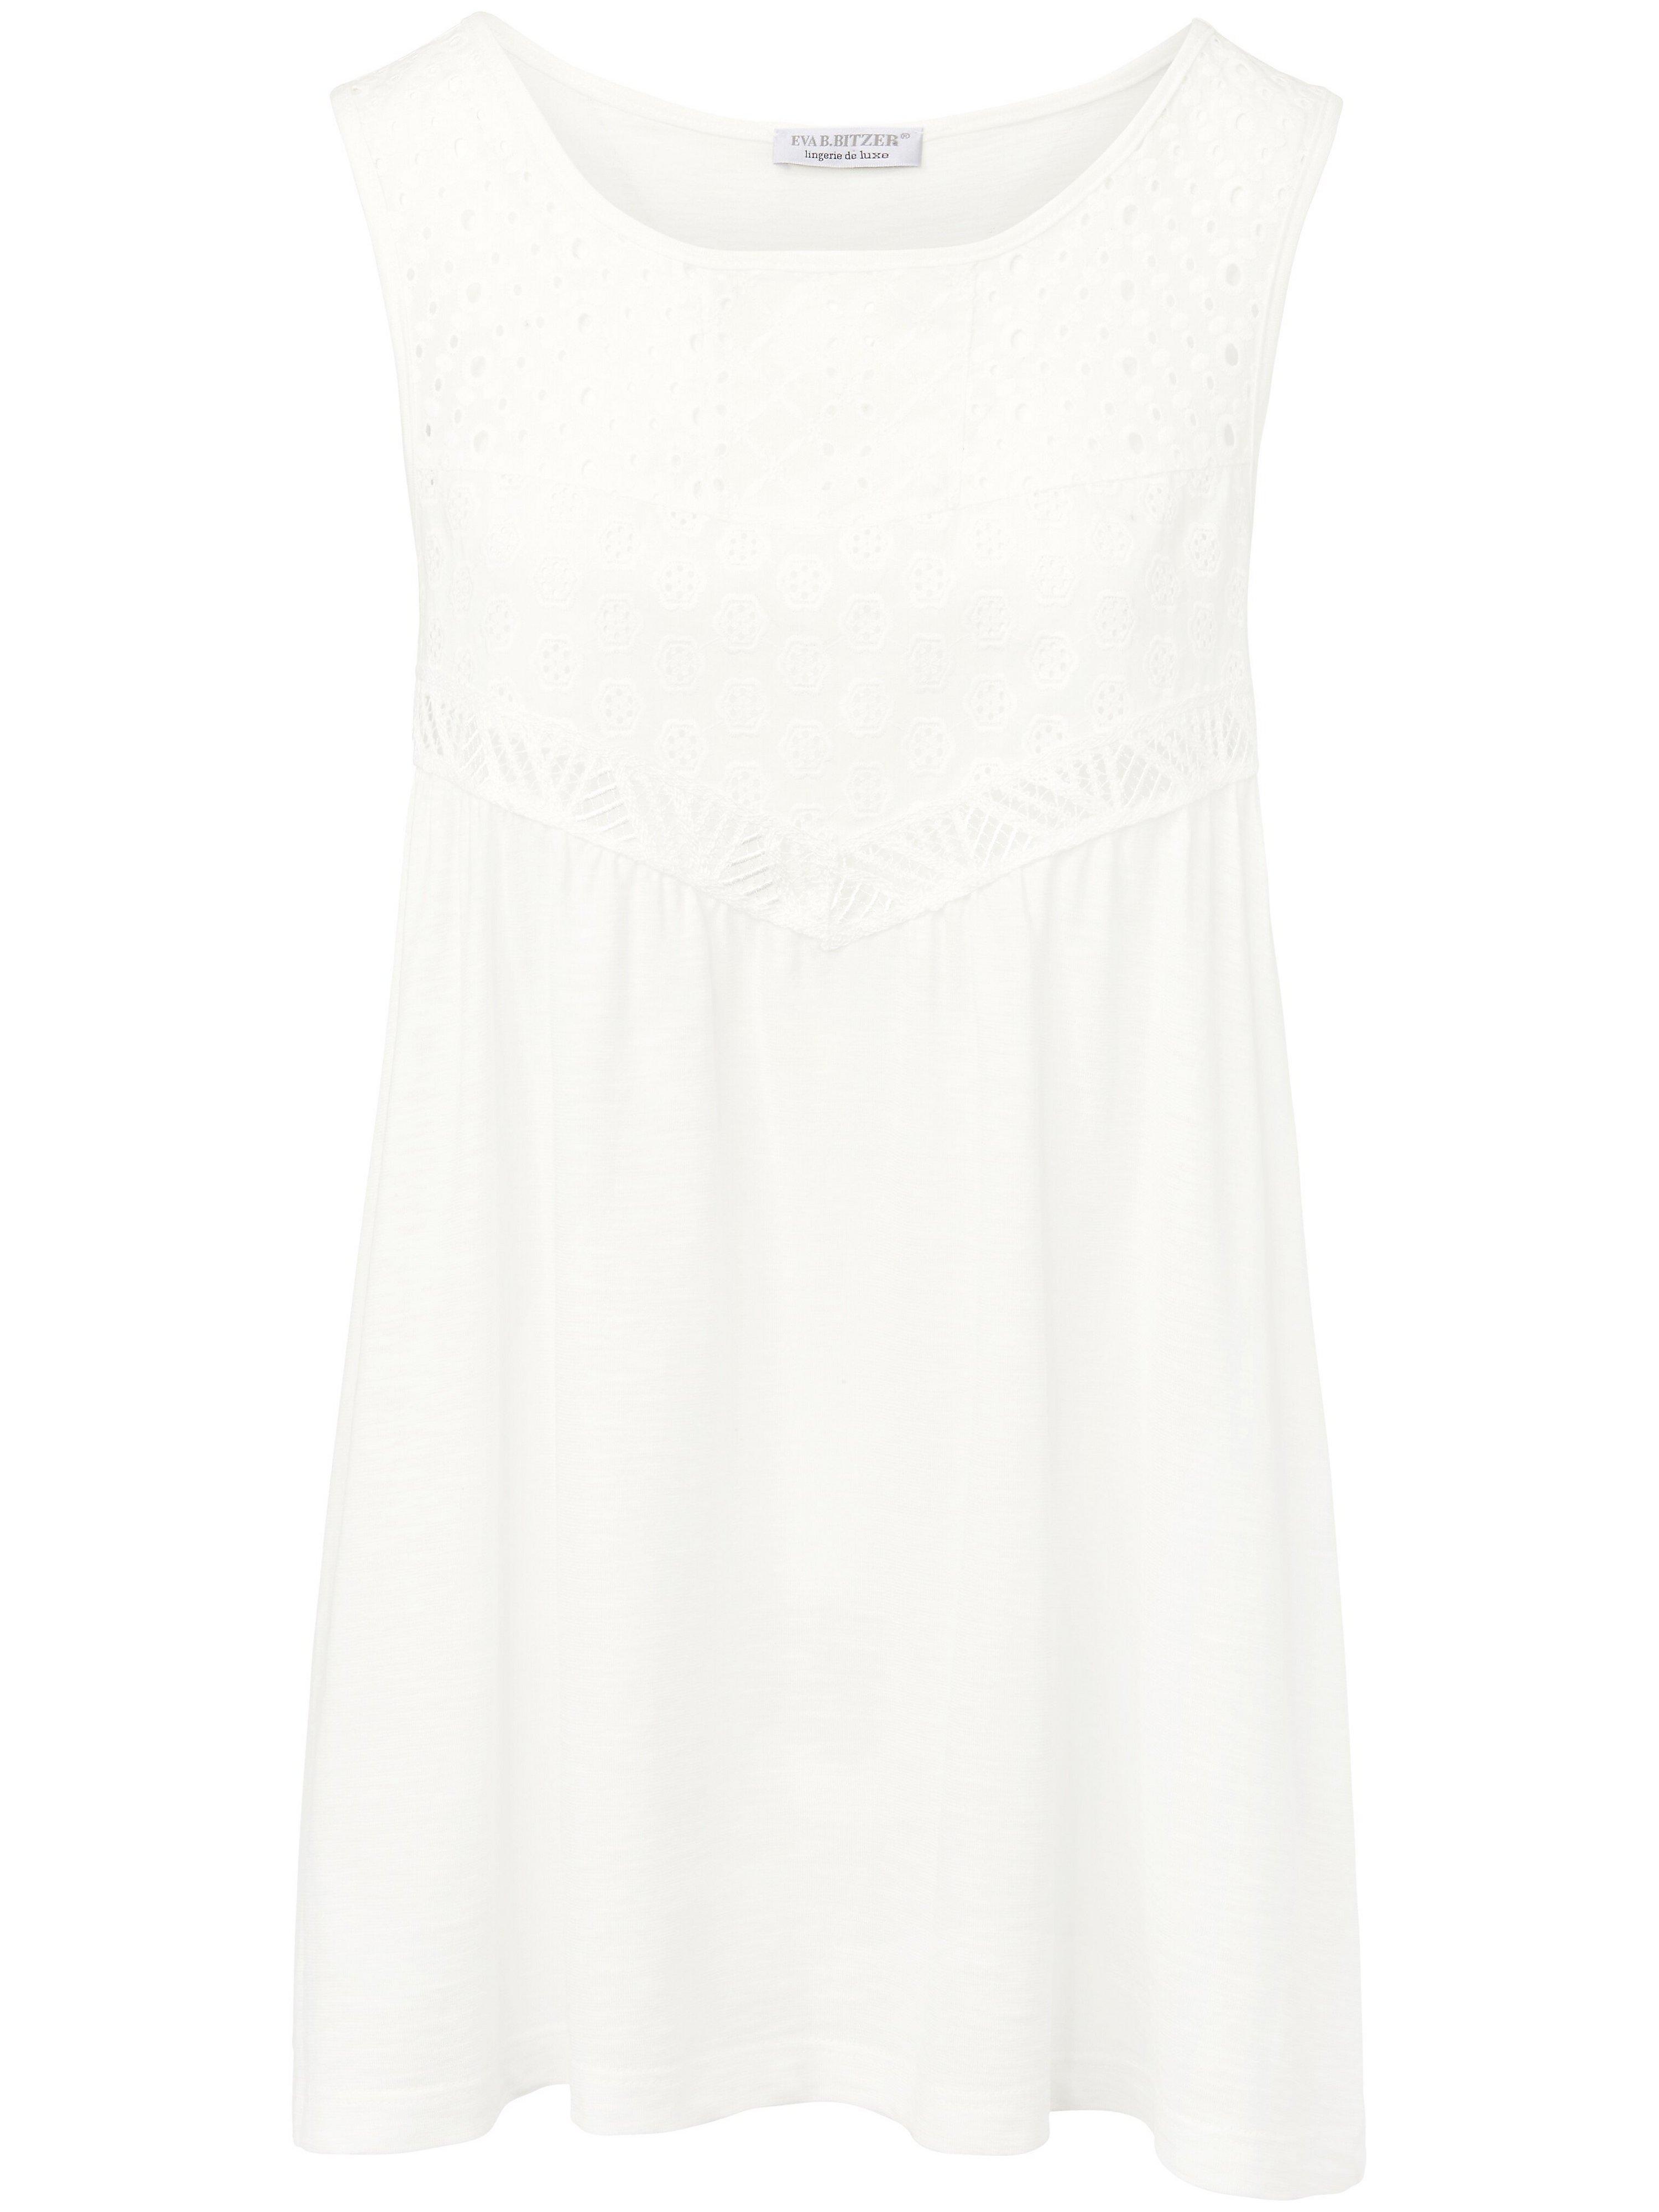 Le top 100% coton  Eva B. Bitzer blanc